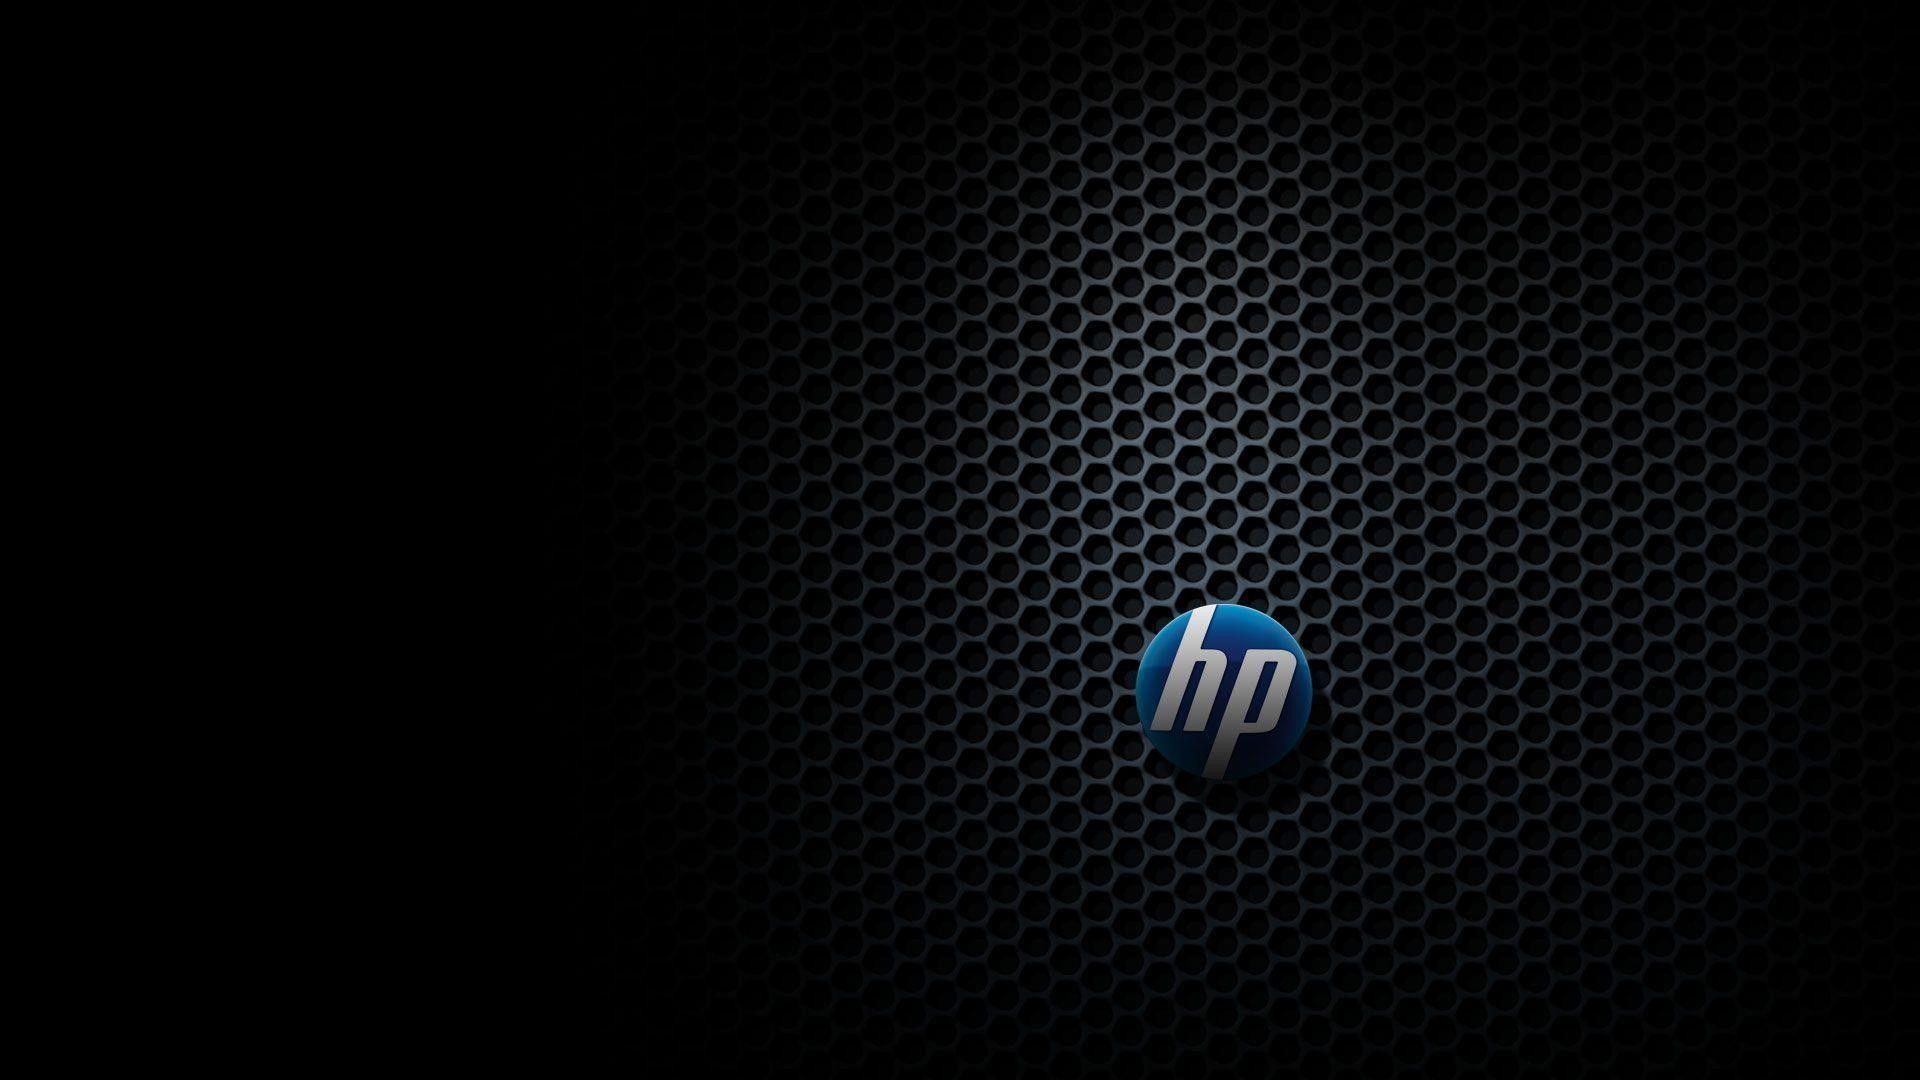 Inspirational Full Hd Hp Laptop Wallpapers Gambar Windows 10 Desain